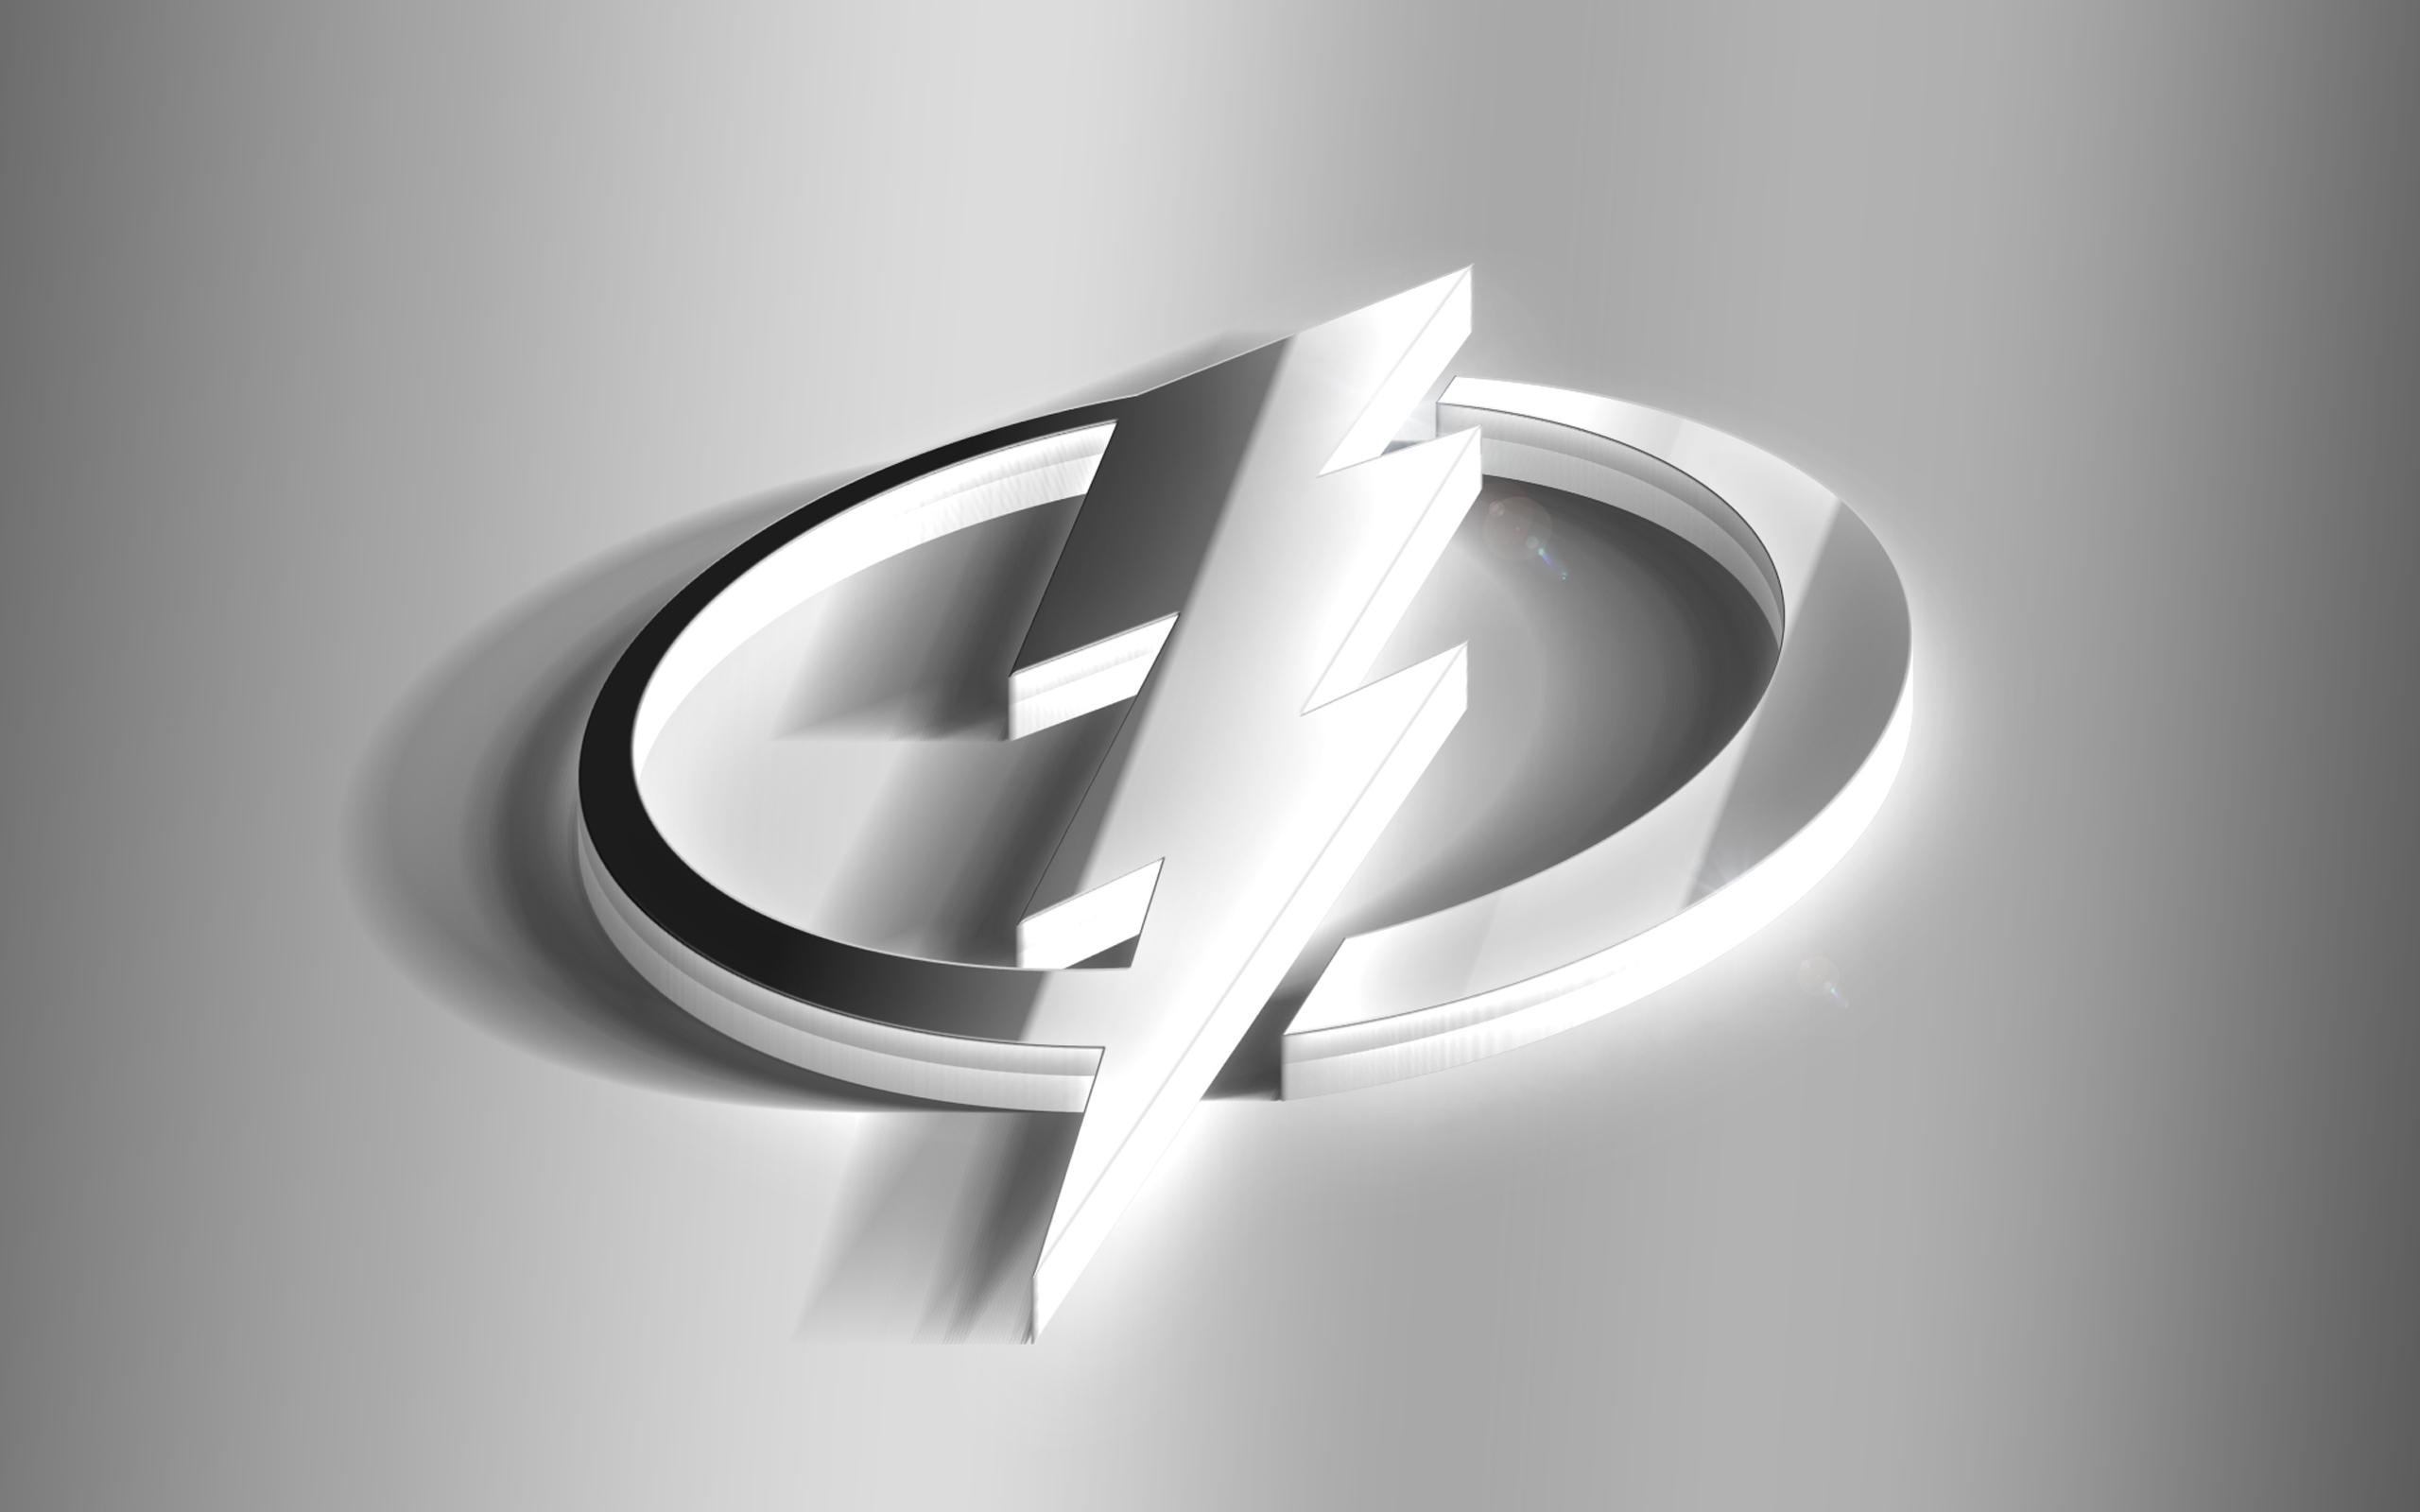 Tampa Bay Lightning Hd Wallpaper Background Image 2560x1600